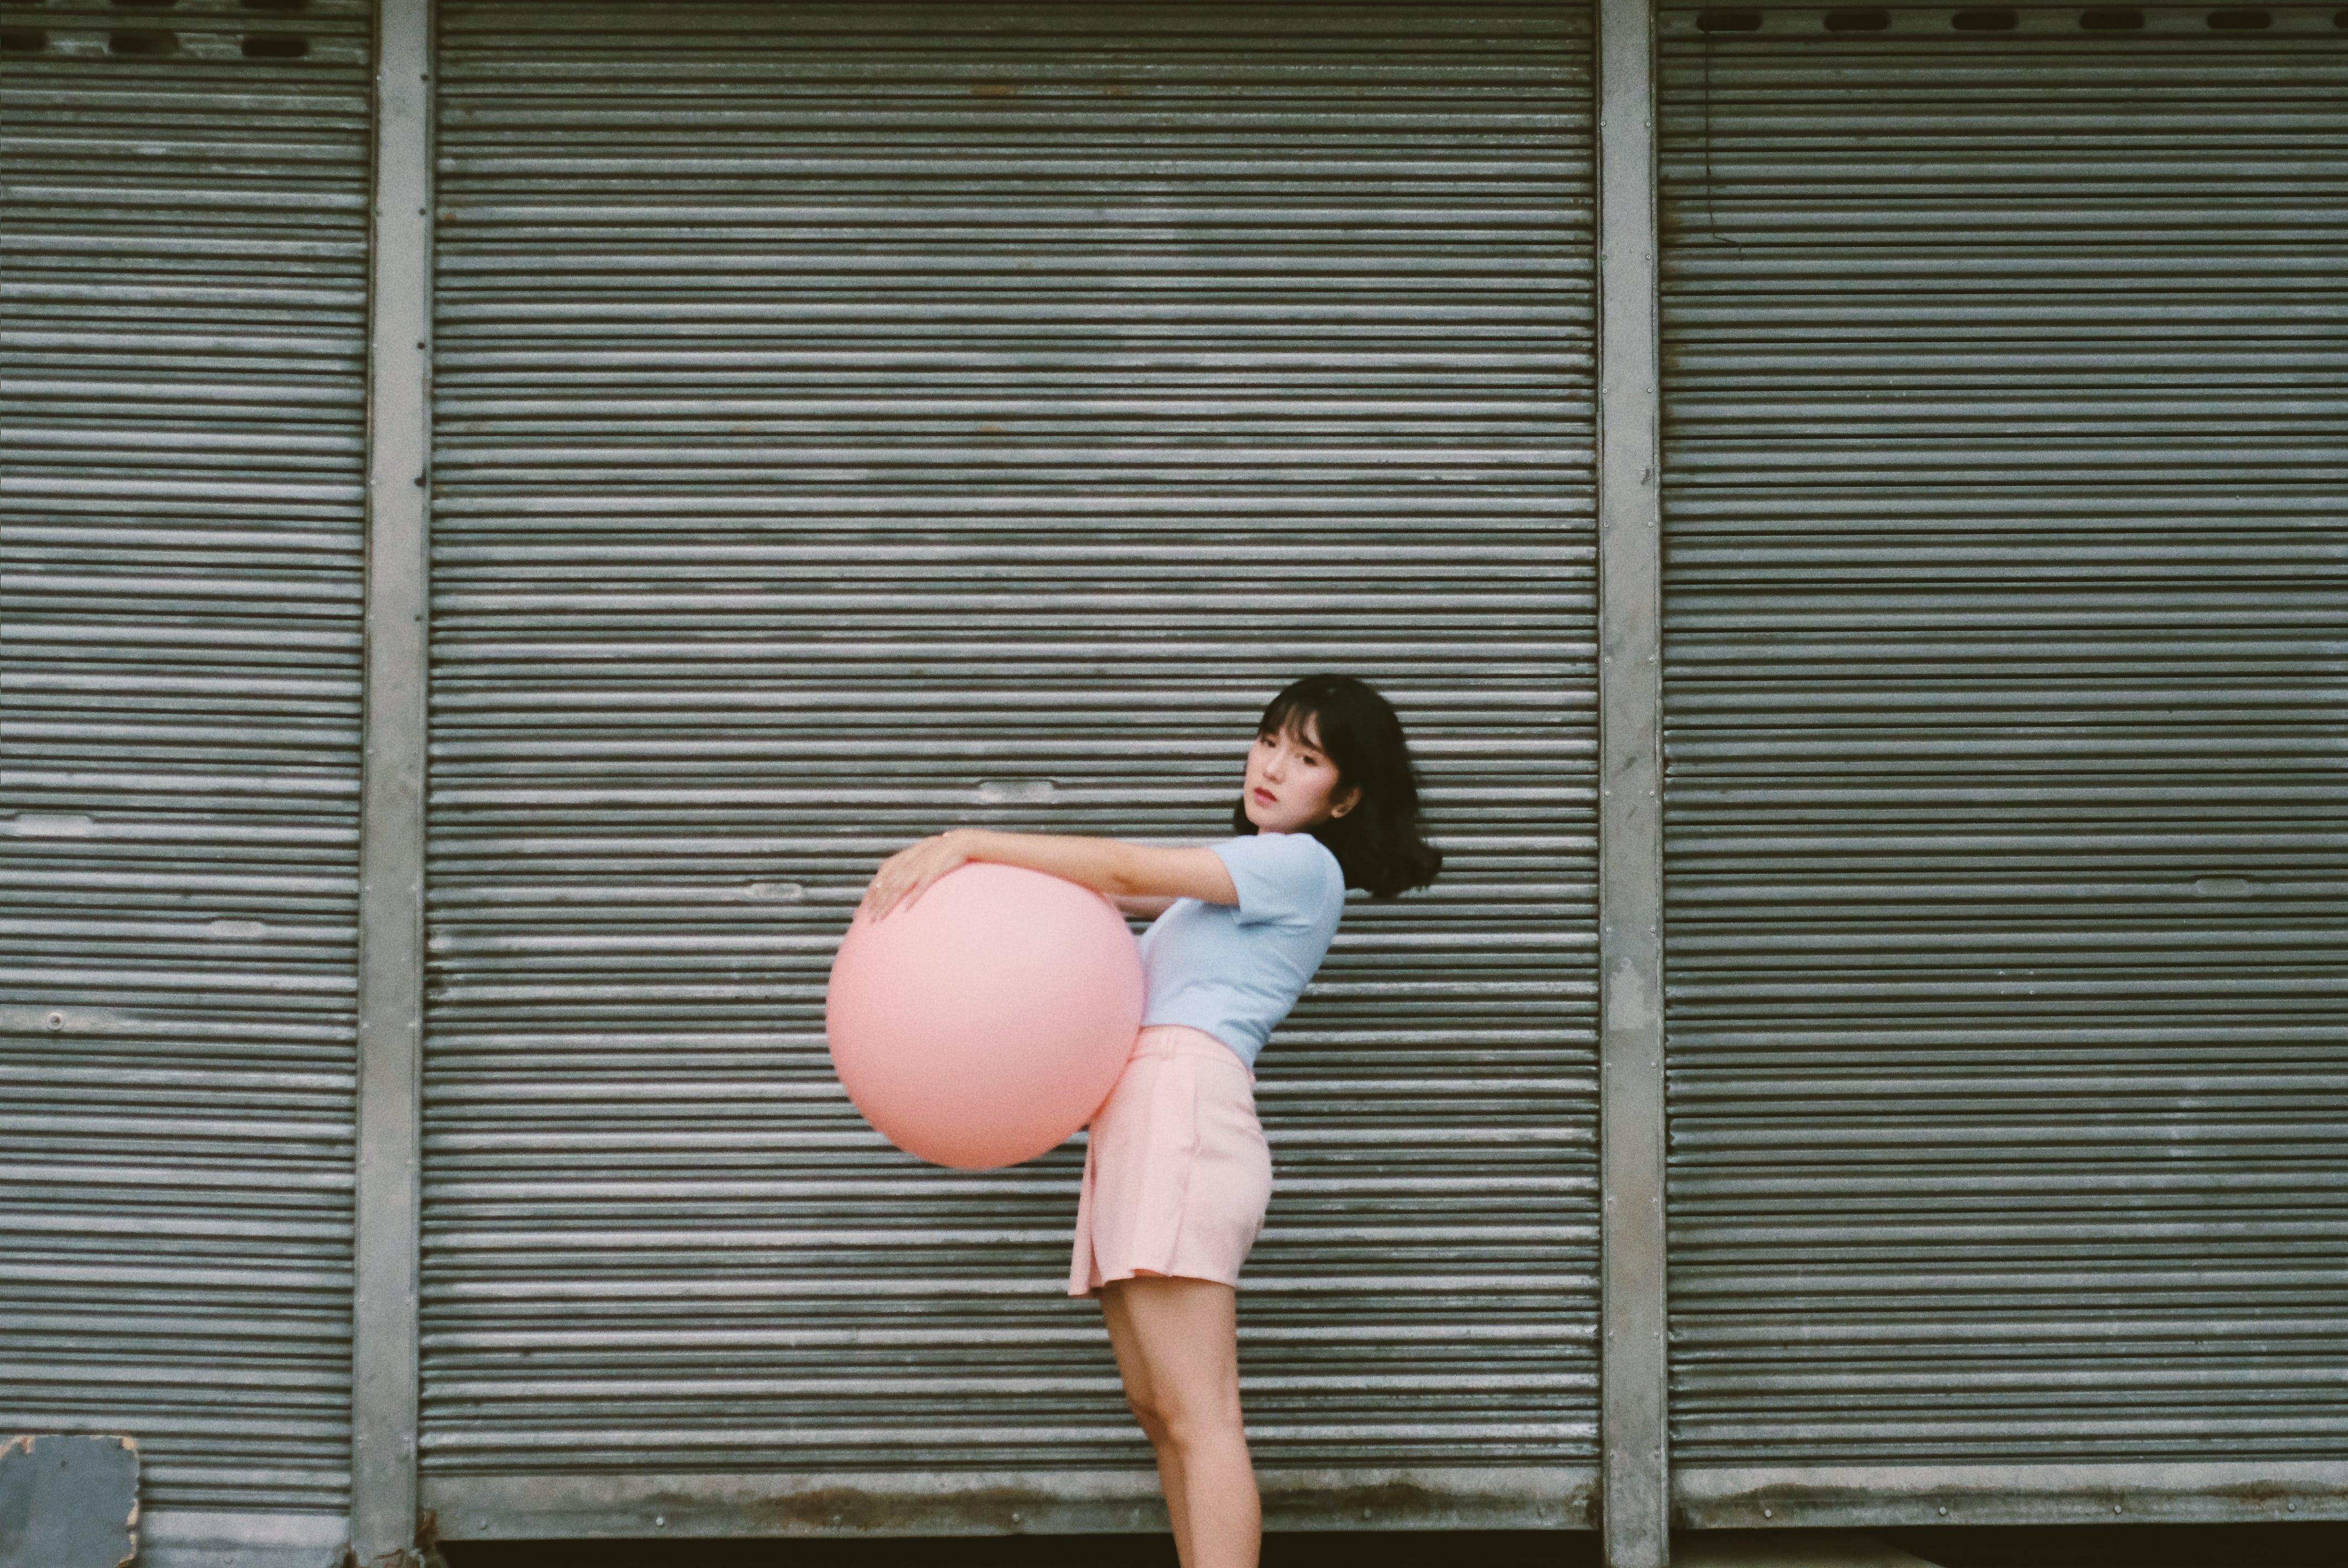 Woman Holding Pink Balloon